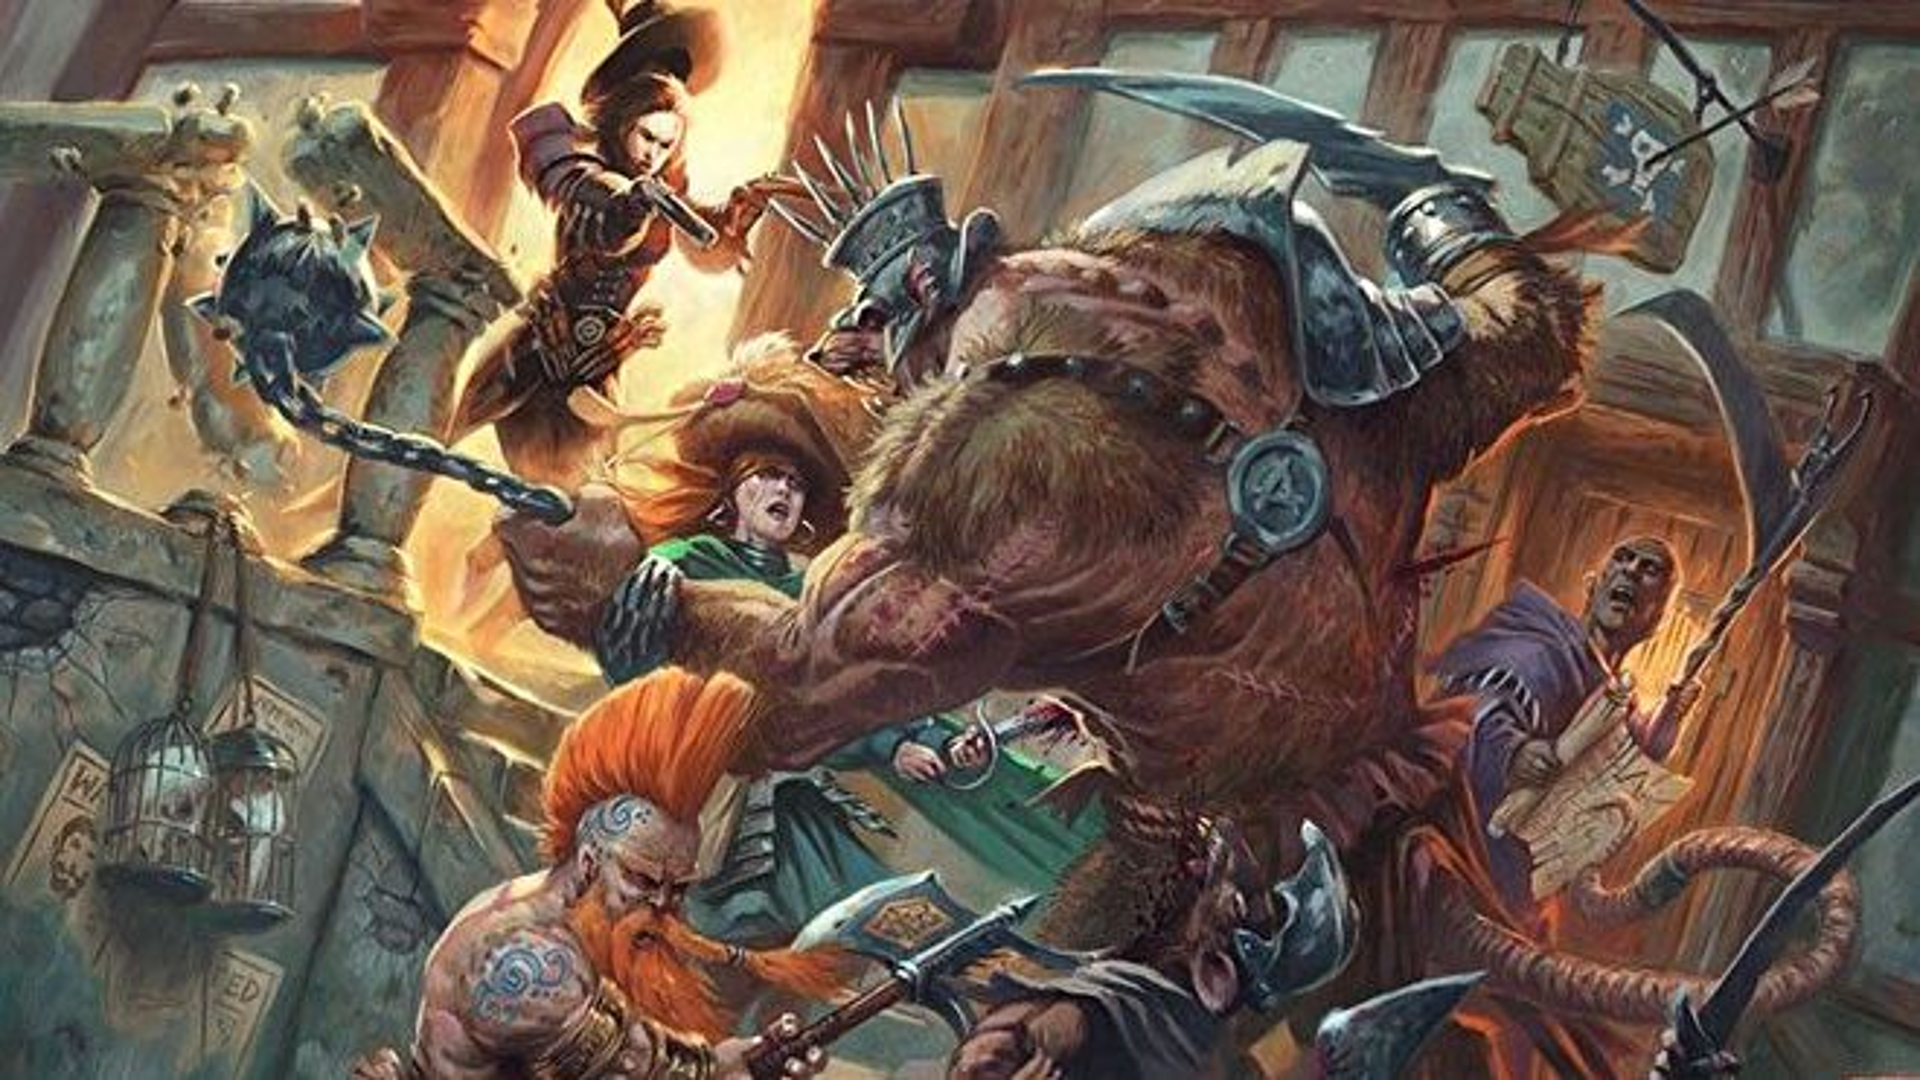 Warhammer fantasy RPG 4E.